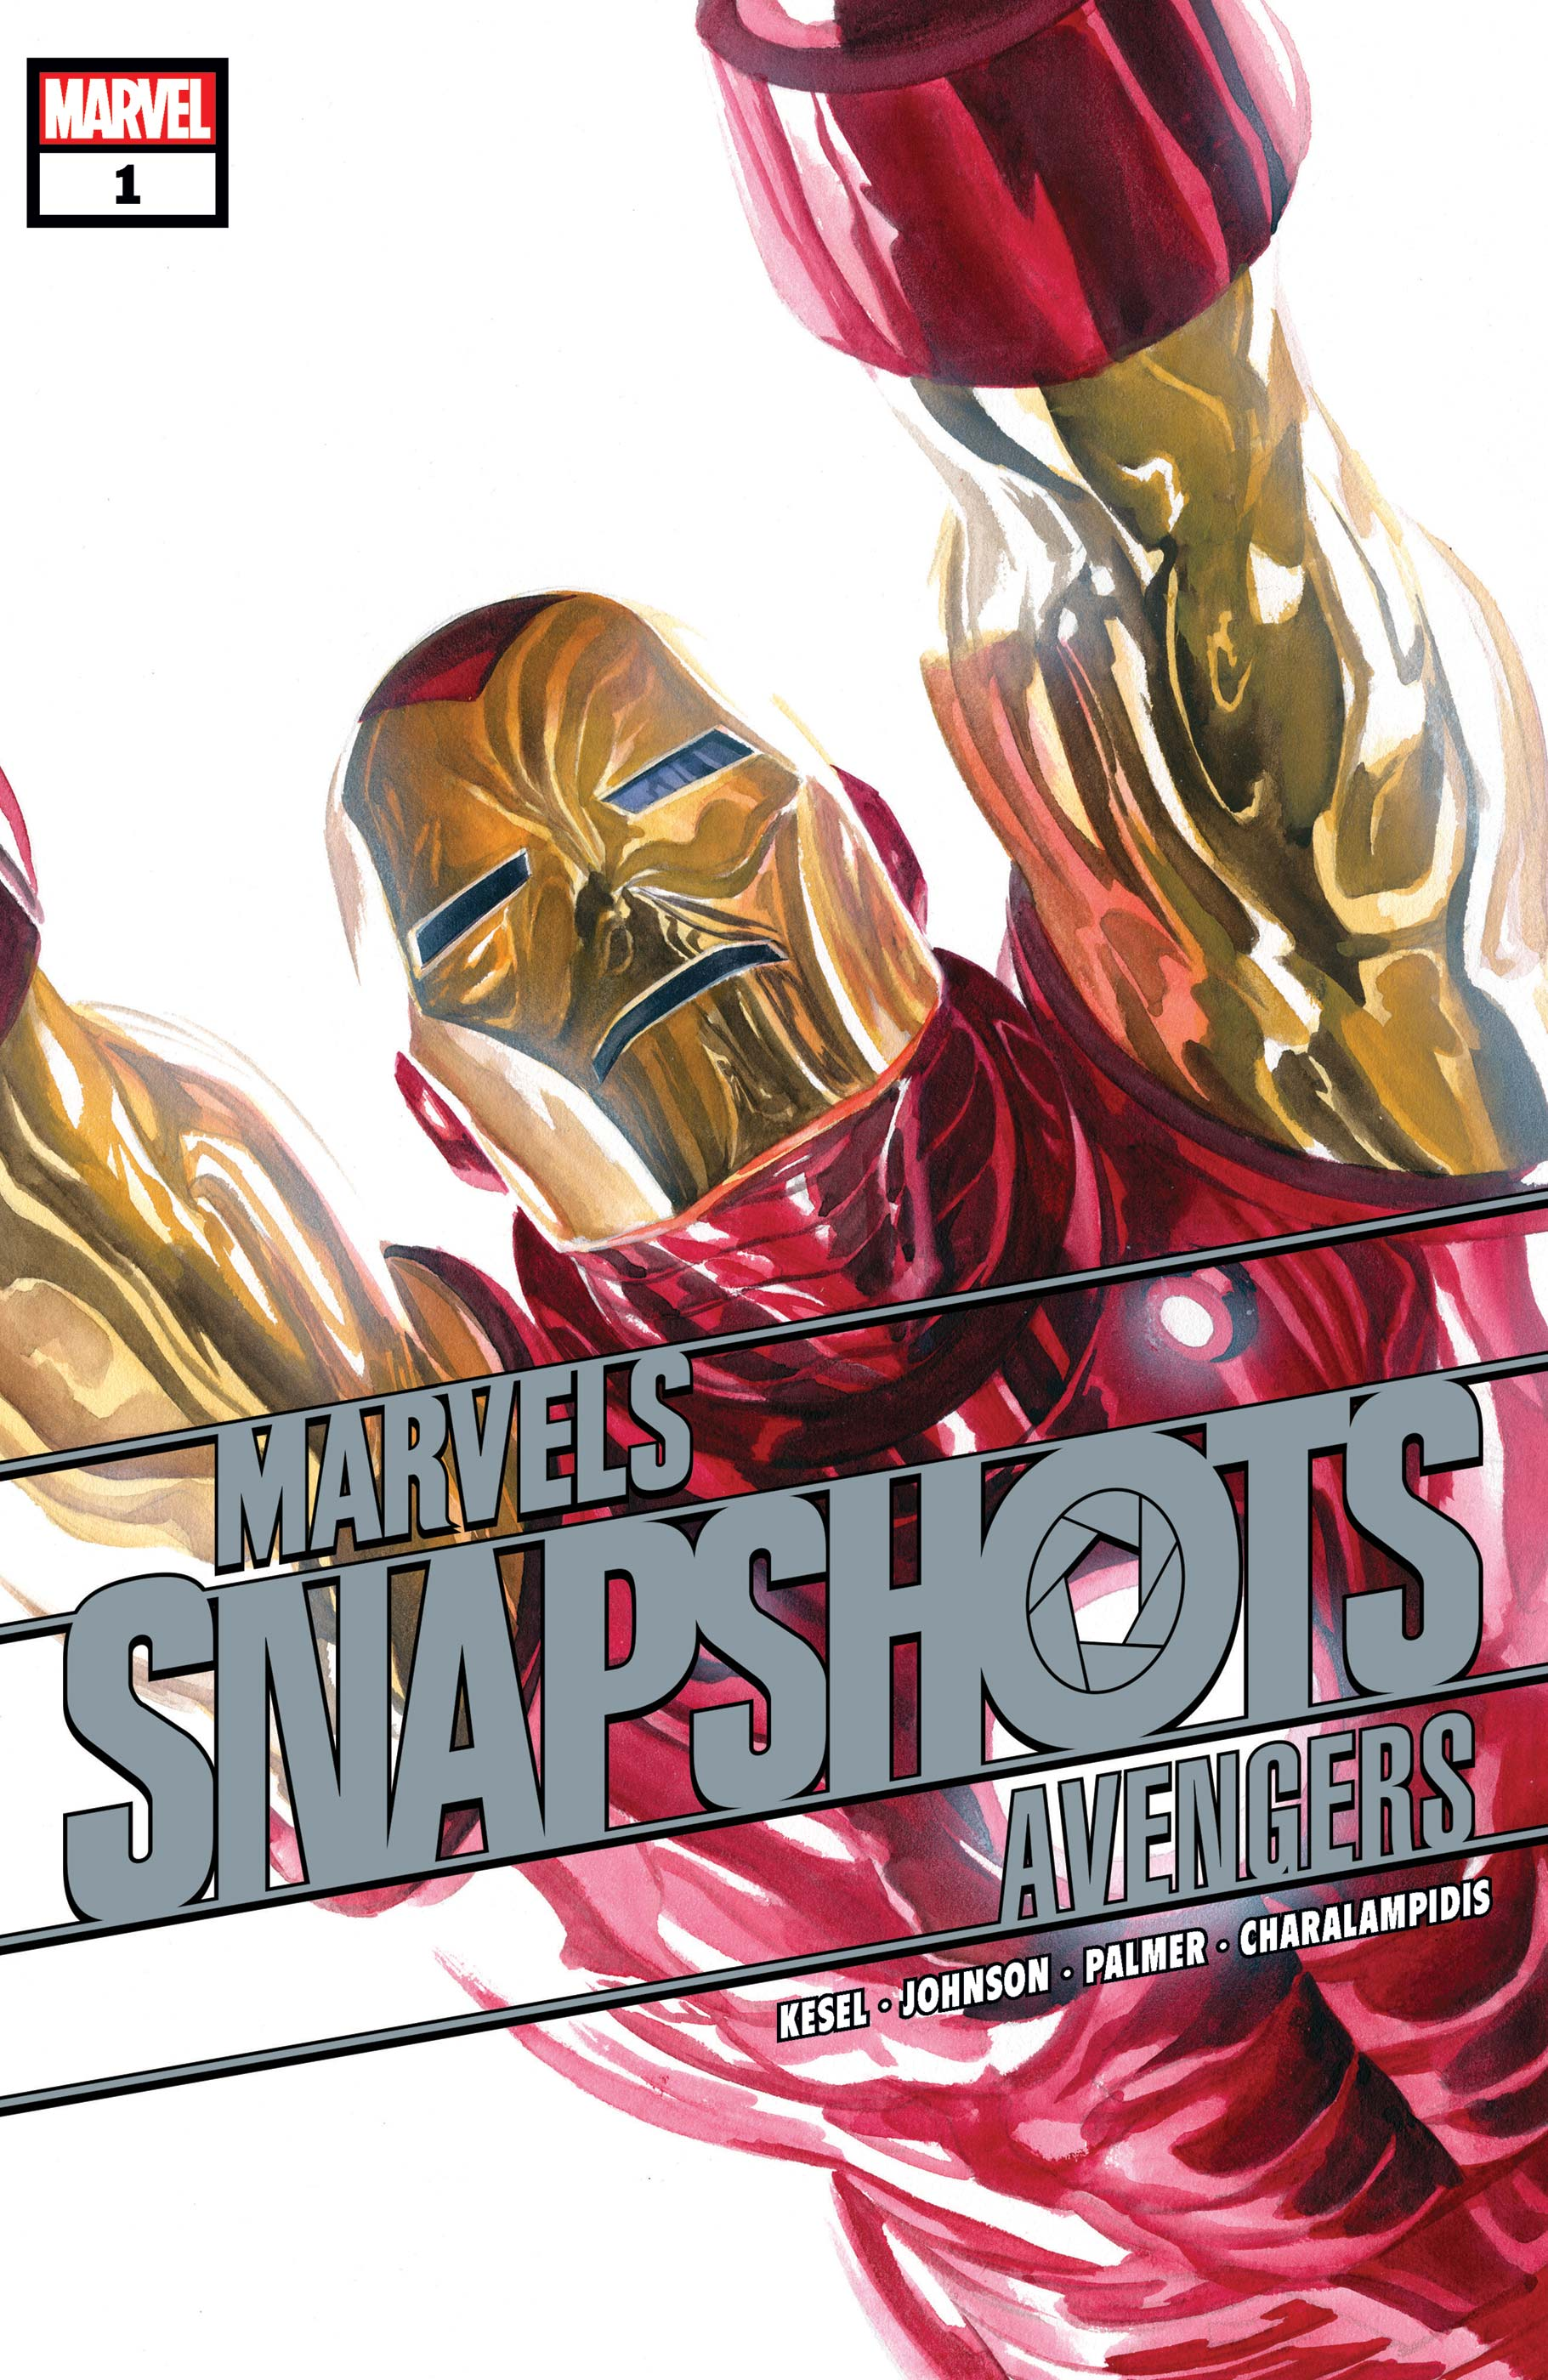 Avengers: Marvels Snapshots (2020) #1